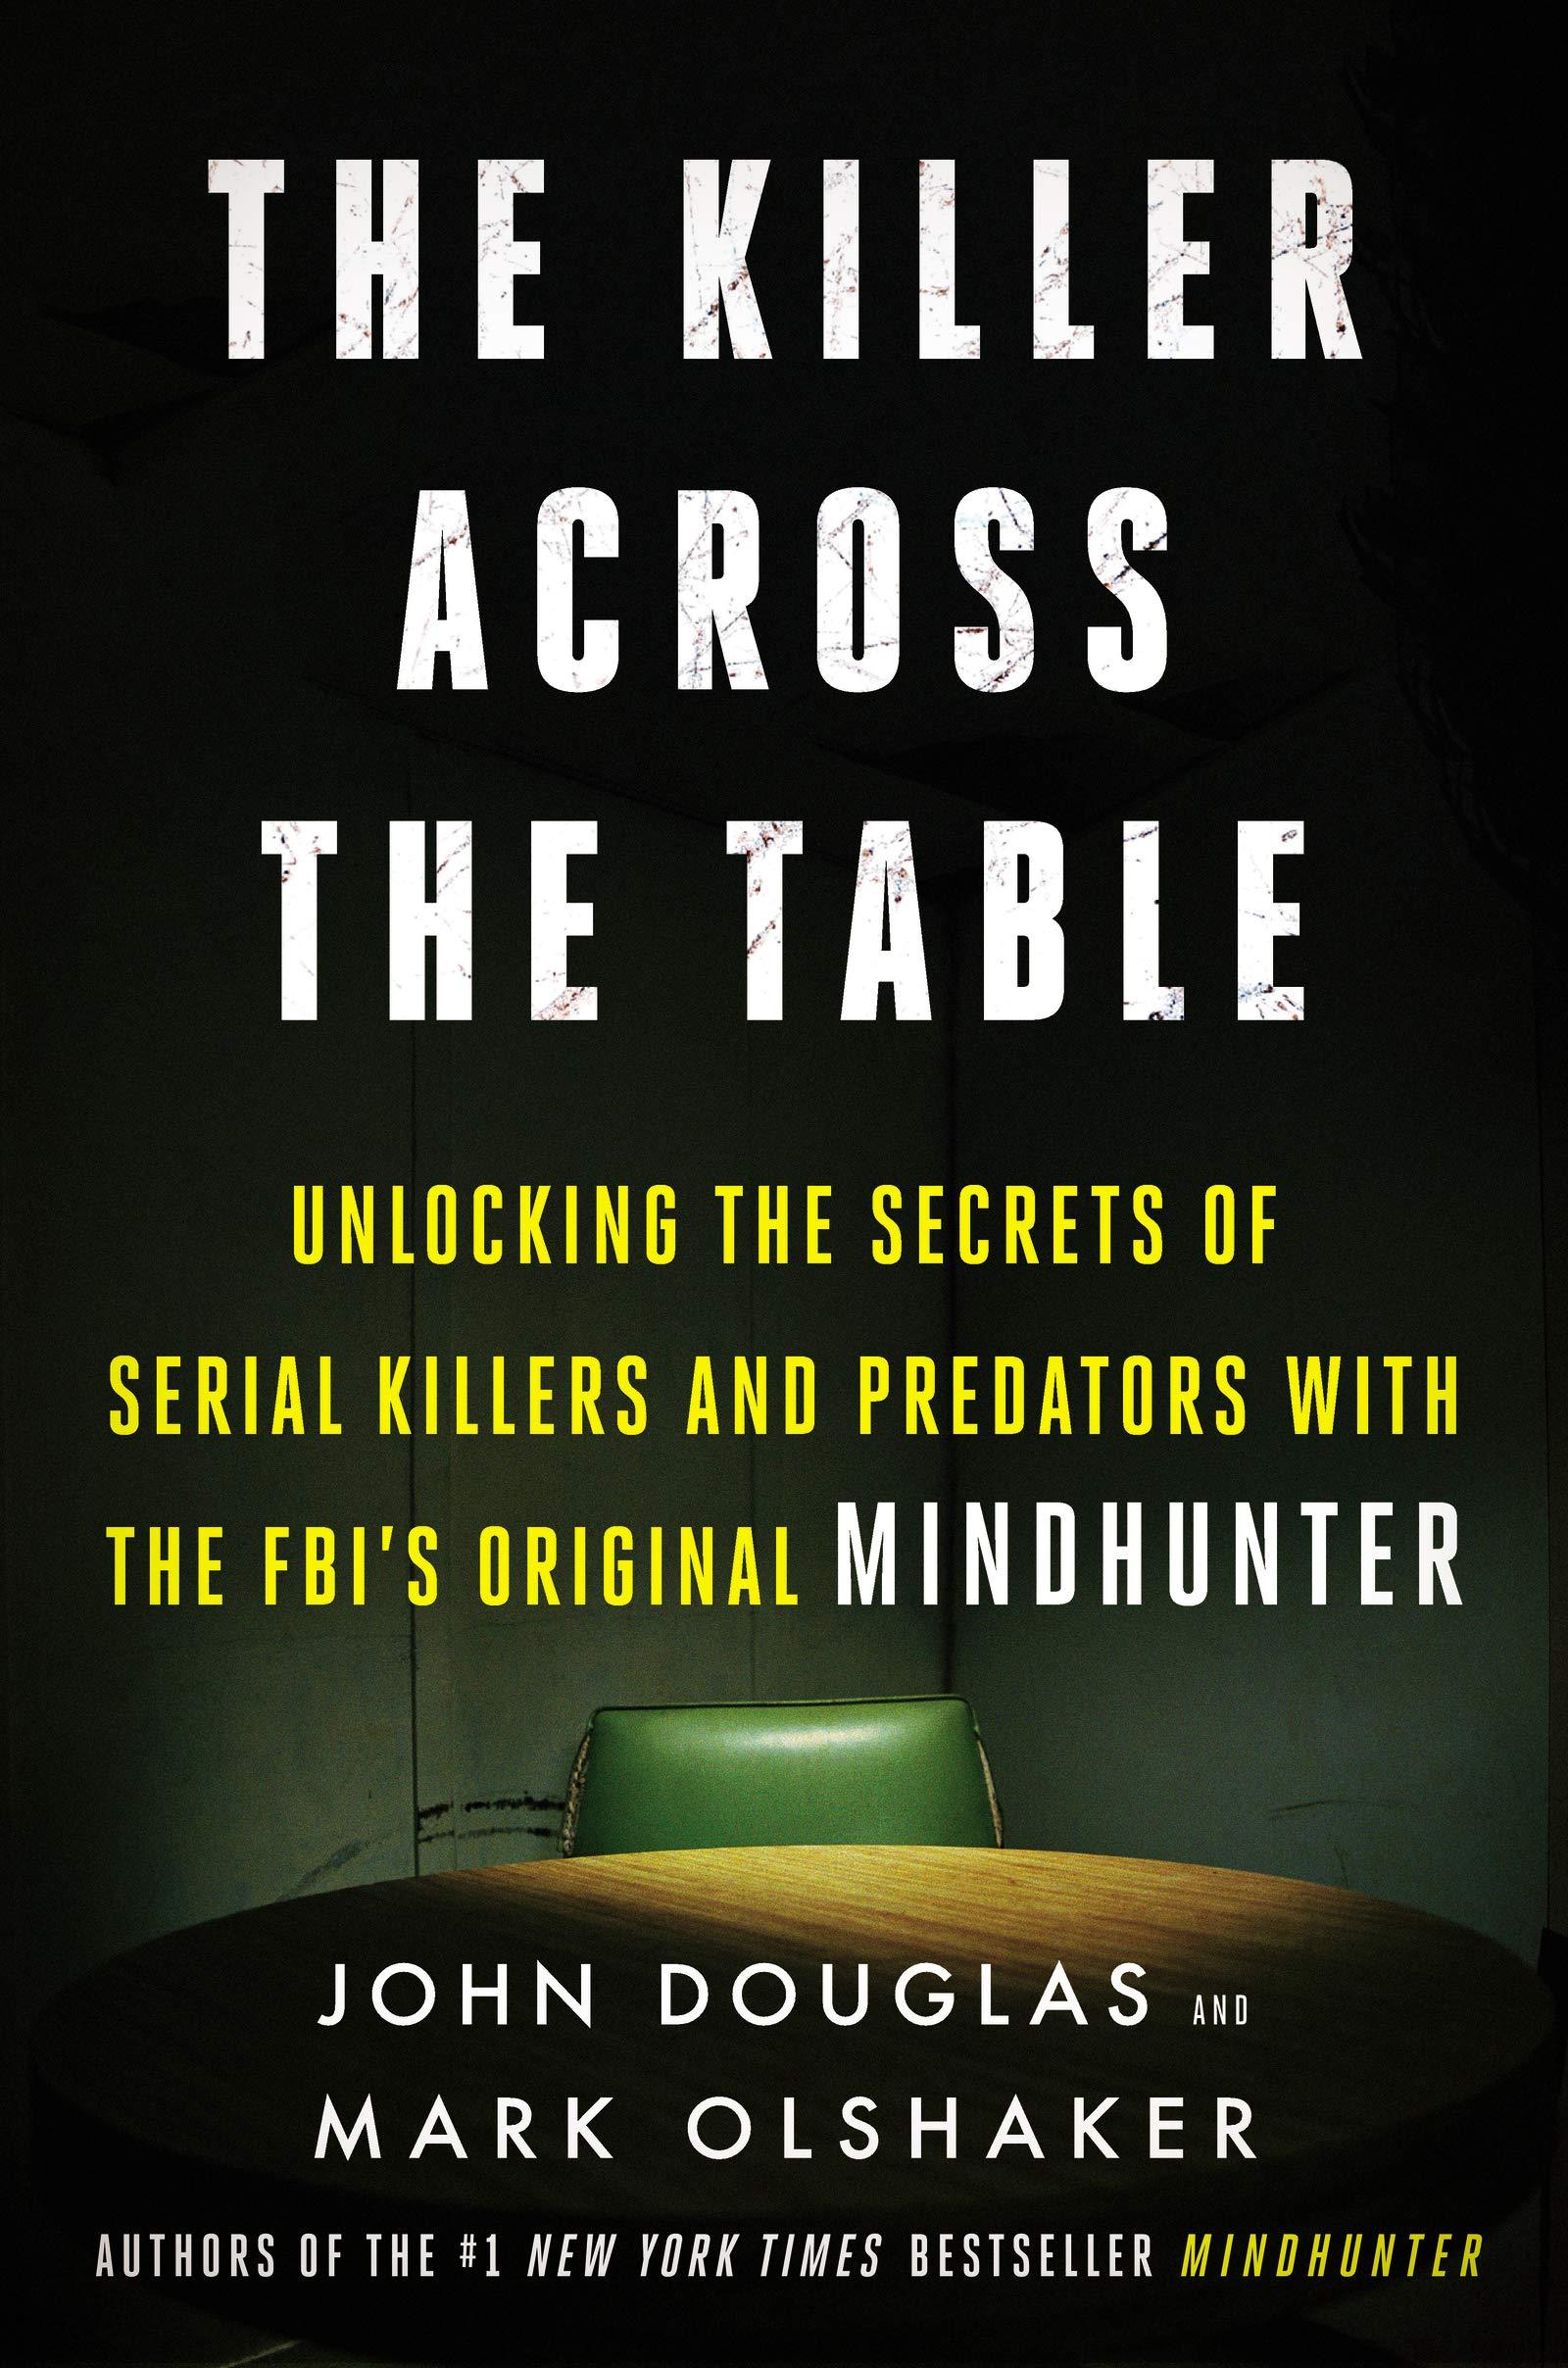 The Killer Across the Table: Unlocking the Secrets of Serial Killers